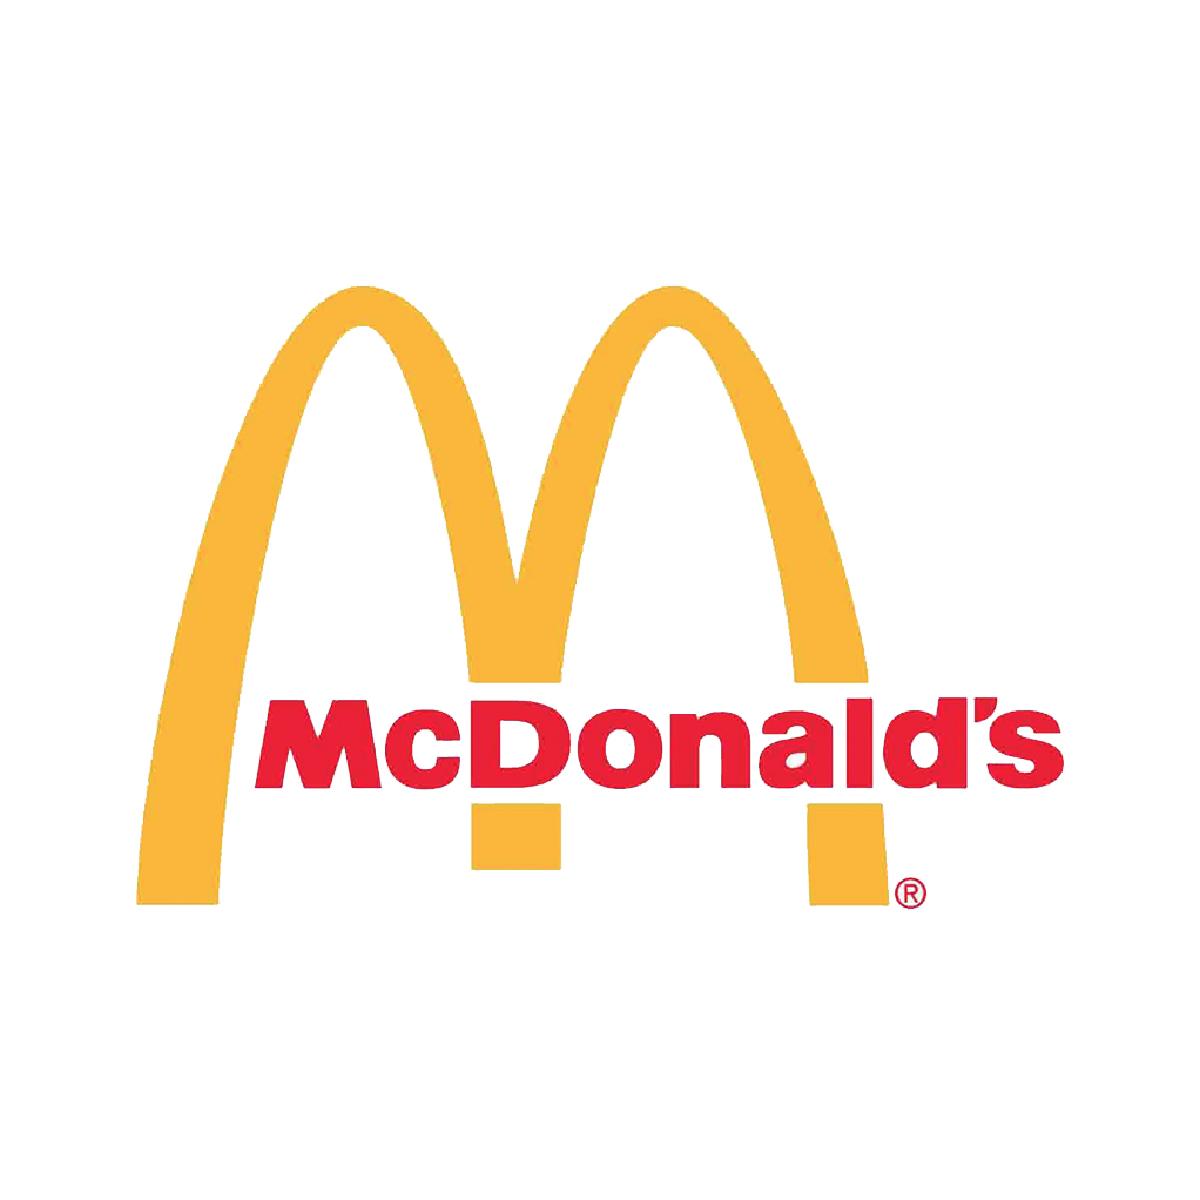 B2B Brand Logos_0008_Mcdonalds.jpg